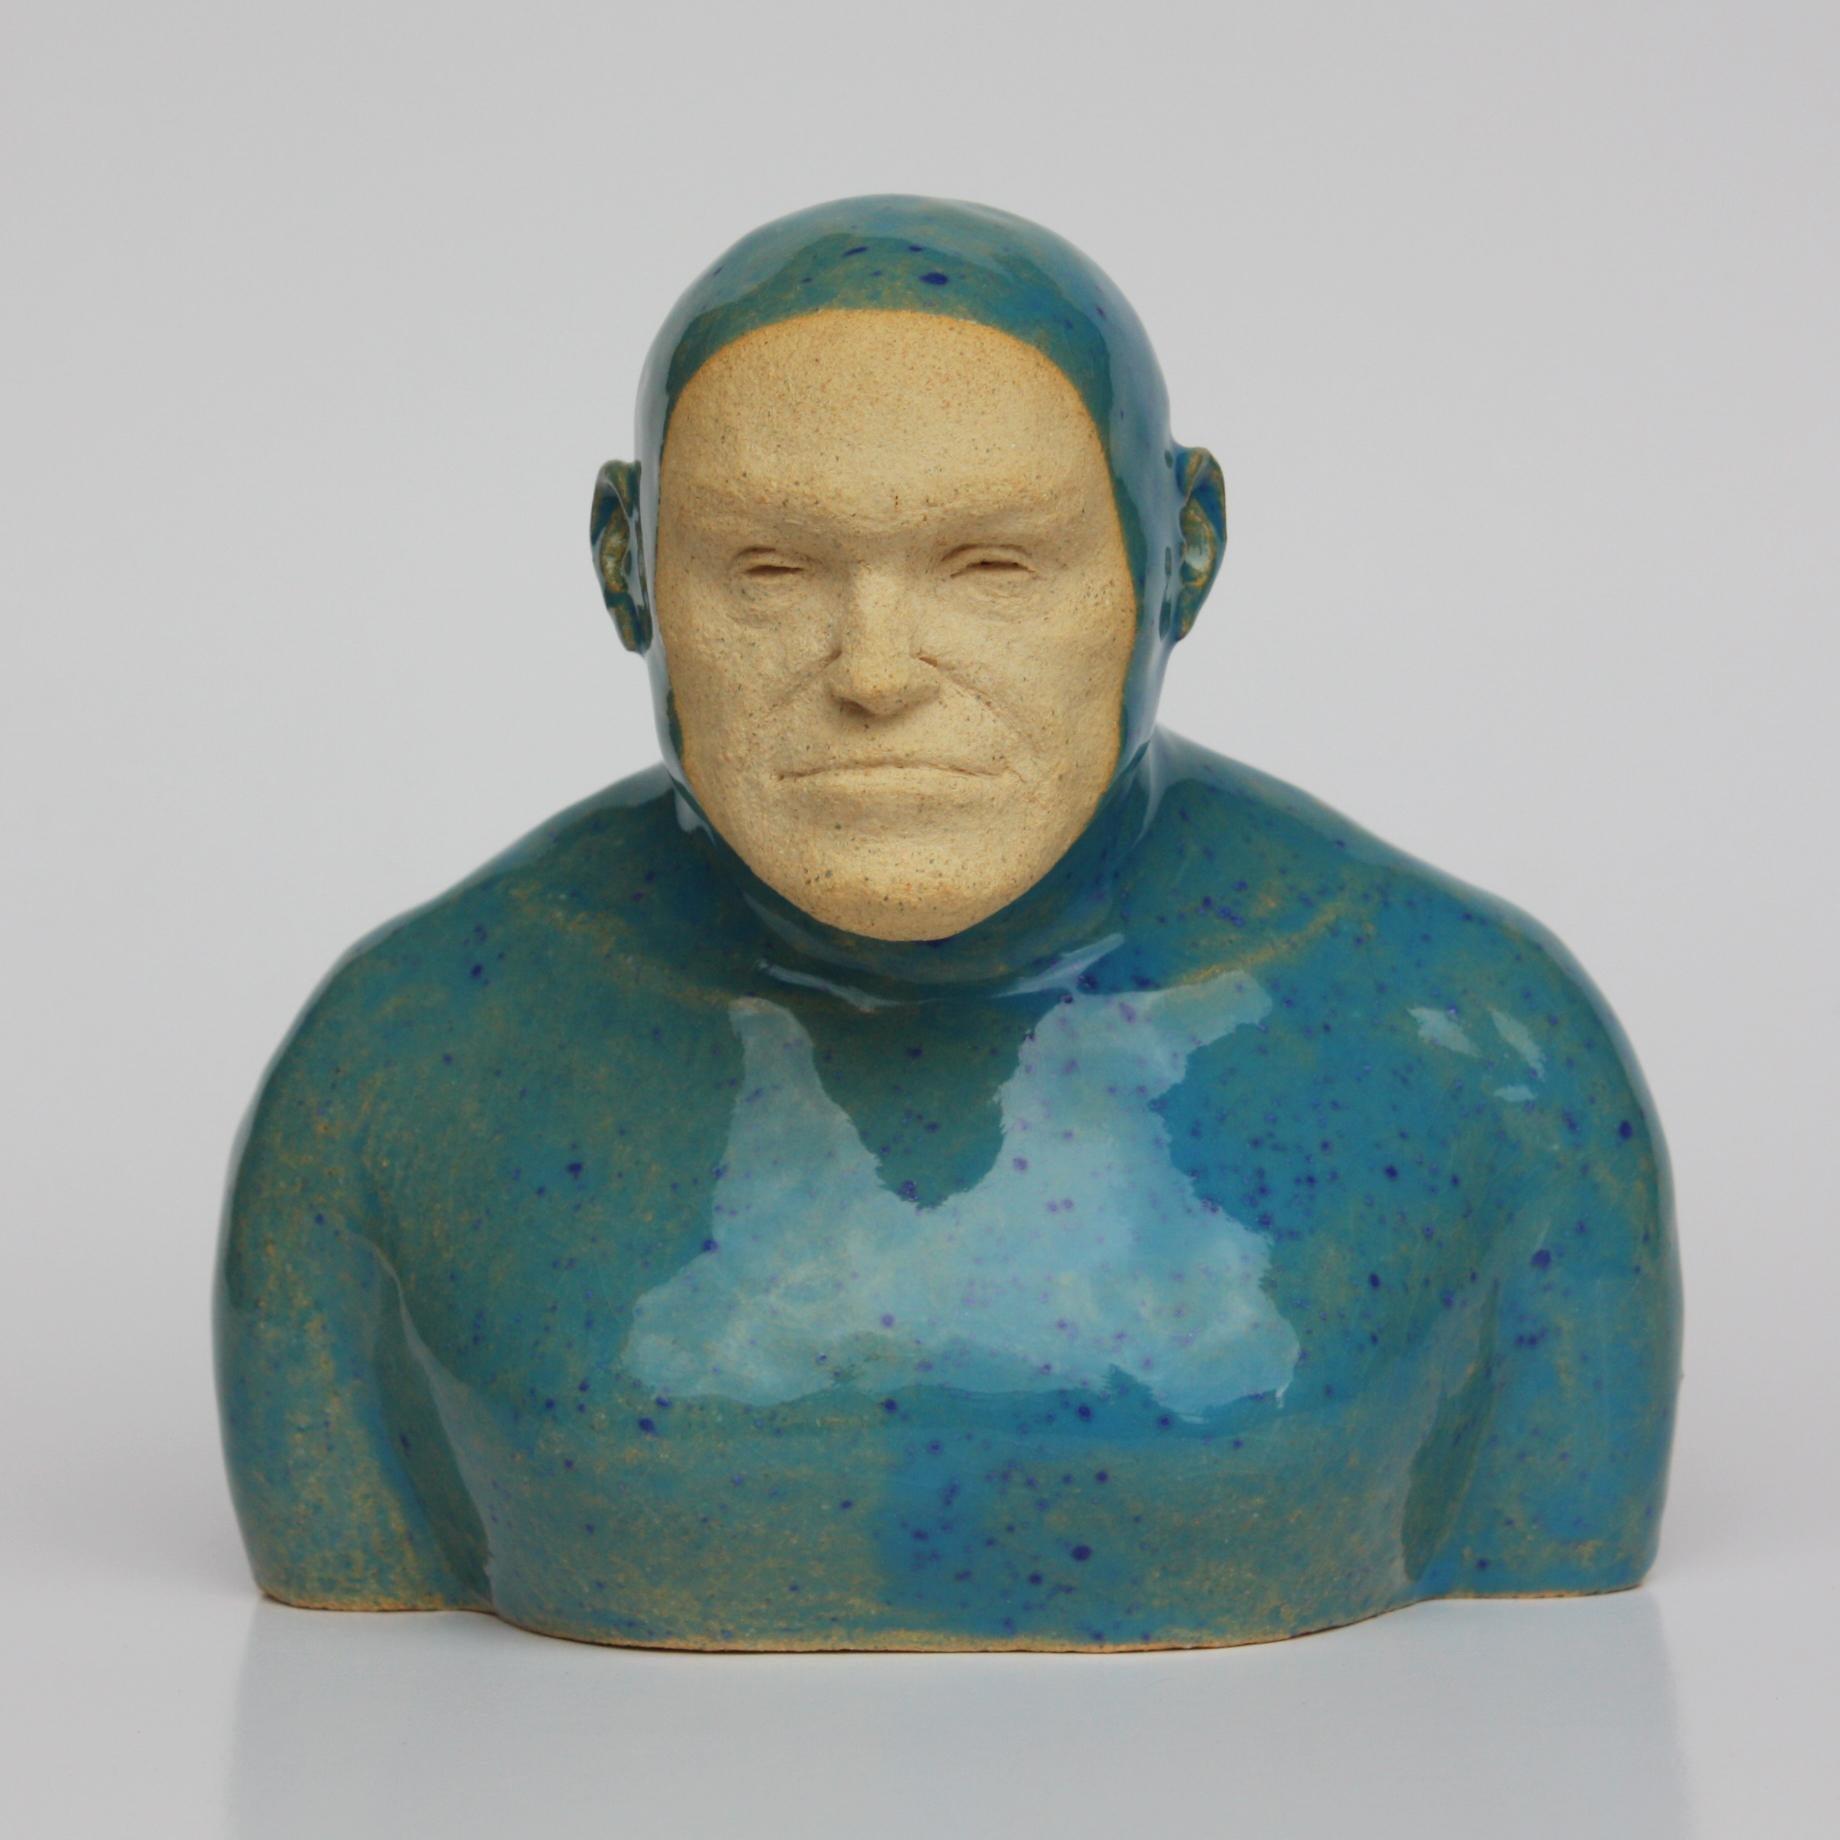 Blue Swimmer - Contemporary Handmade Glazed Ceramics Sculpture , Man Portrait